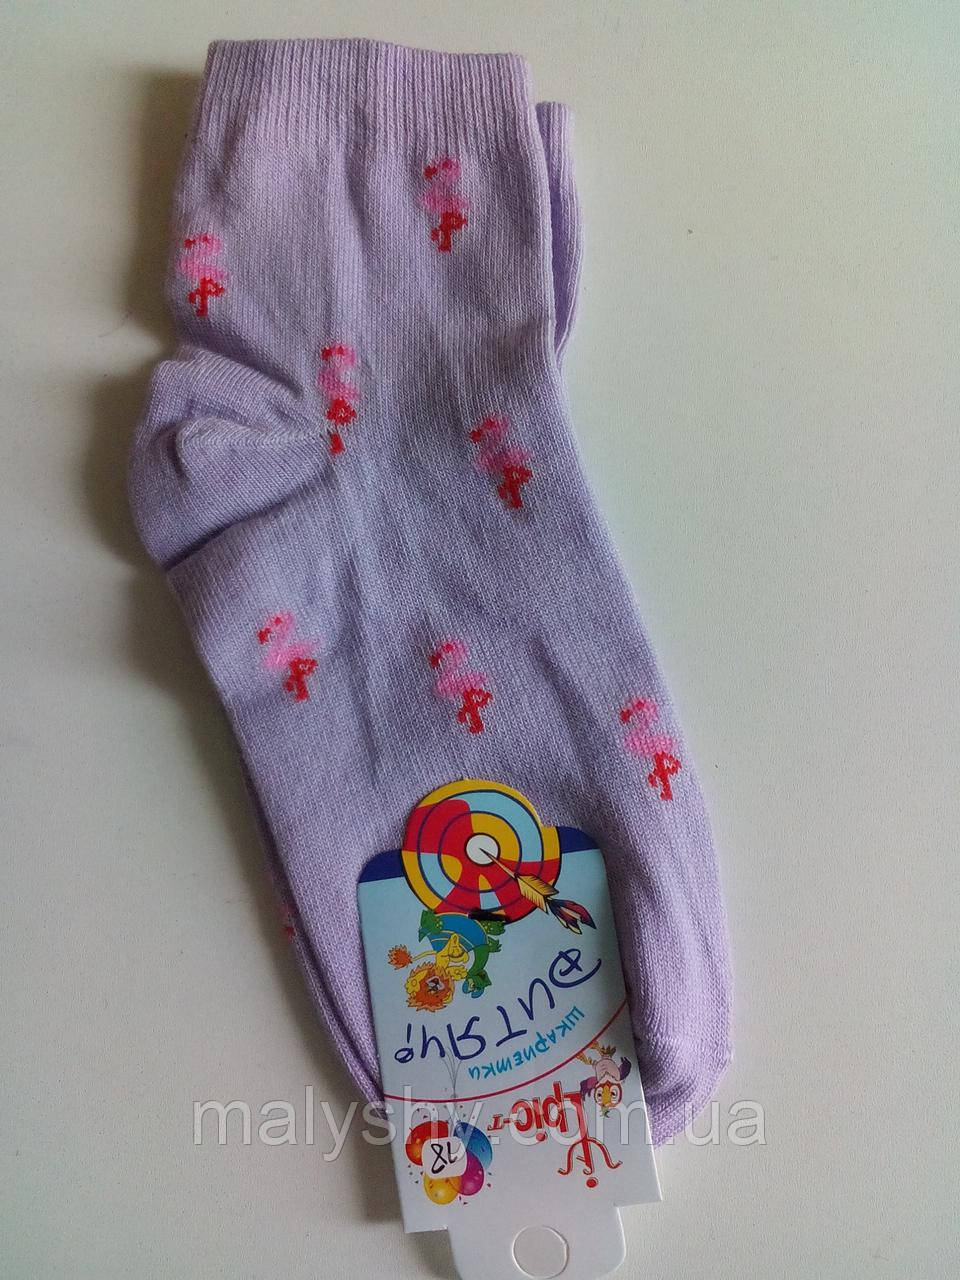 Детские носки демисезонные - Ирис р.18 (шкарпетки дитячі, Іріс)